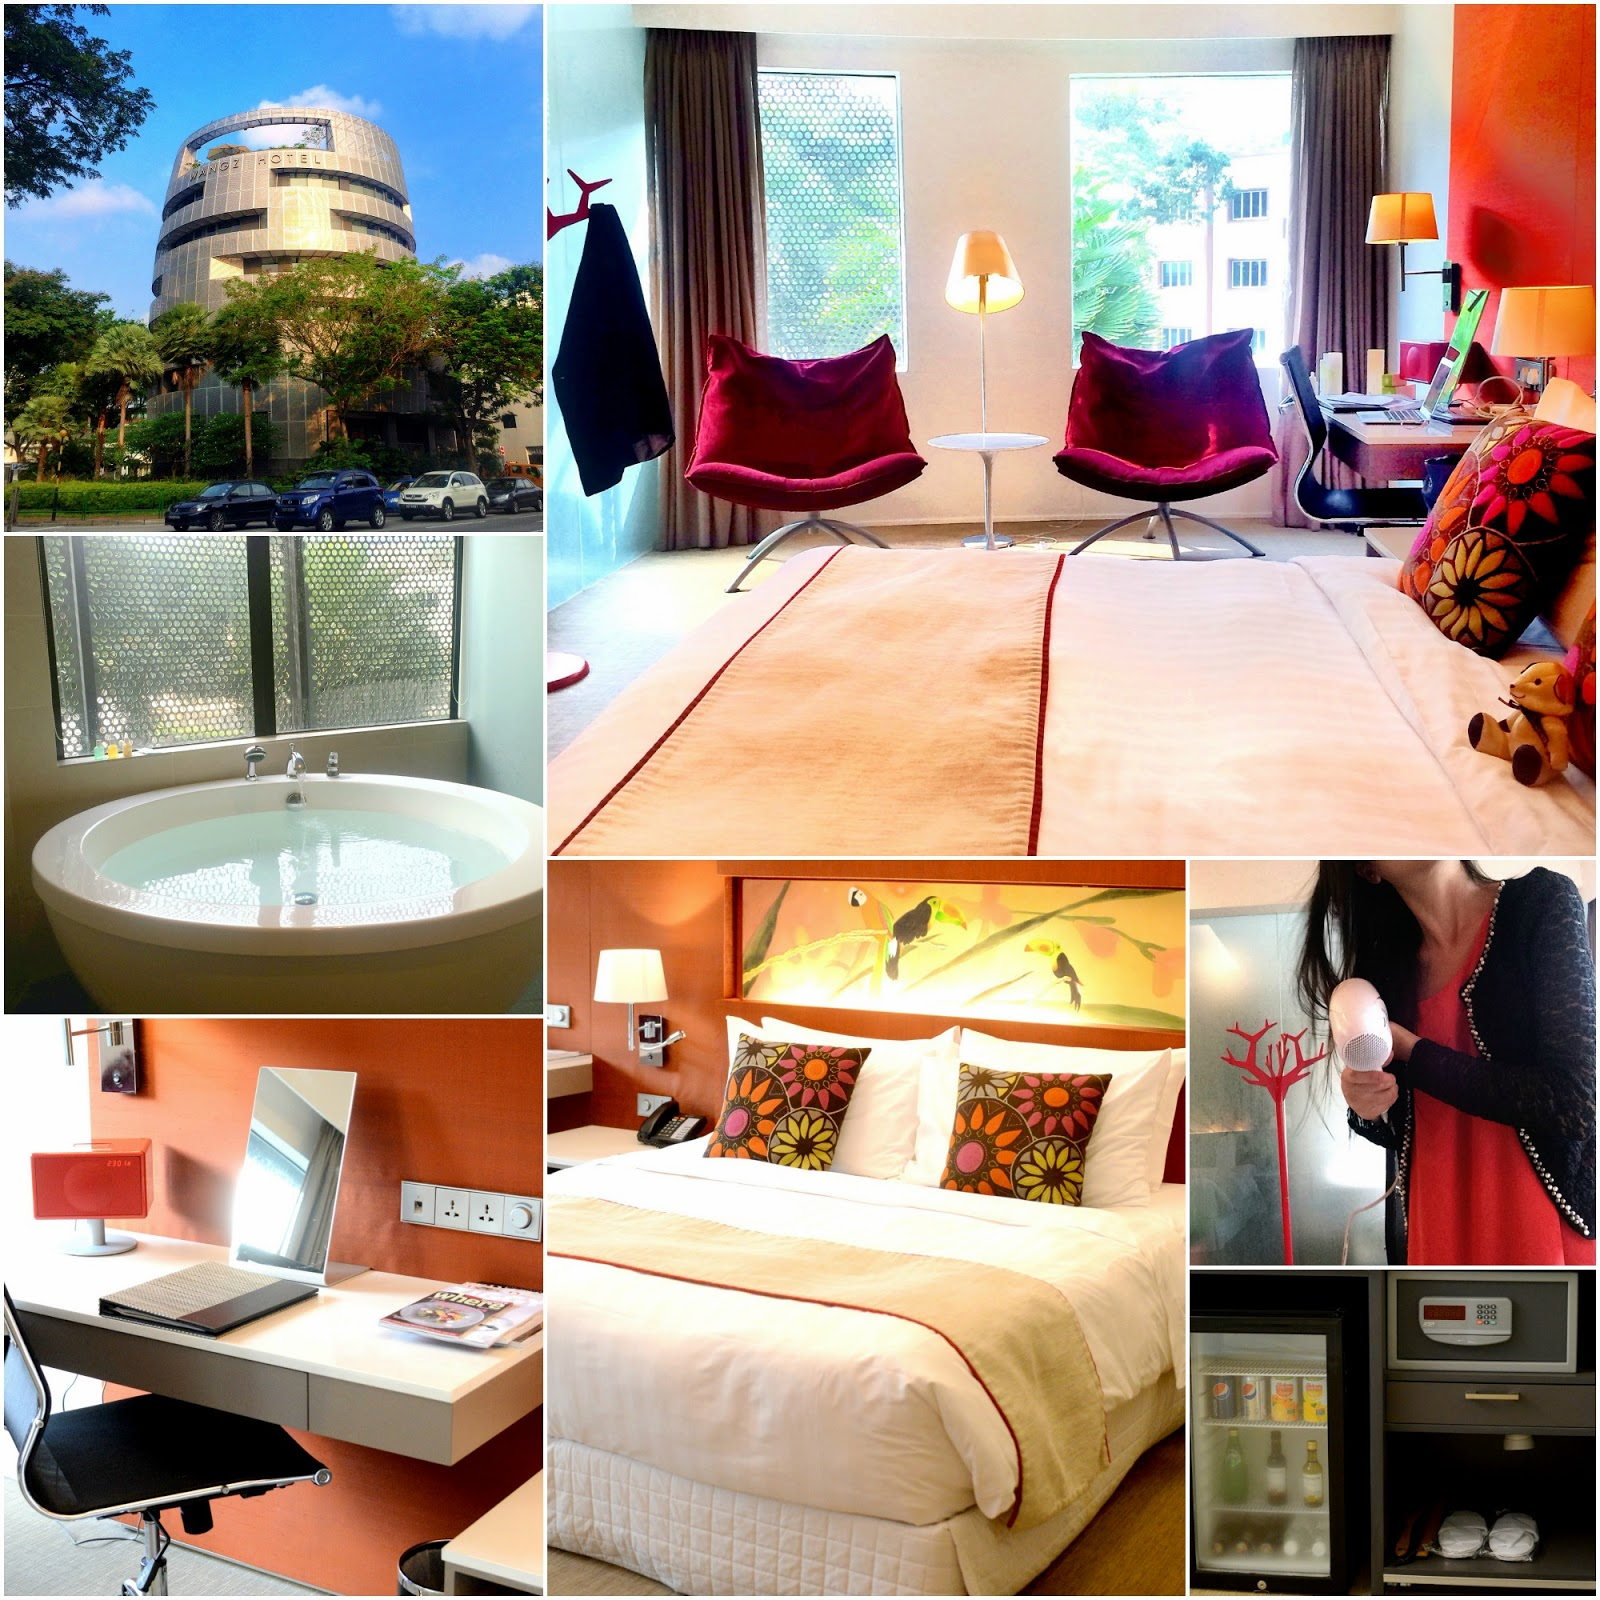 http://www.chocolatemuimui.com/2015/04/wangz-hotel-singapore.html